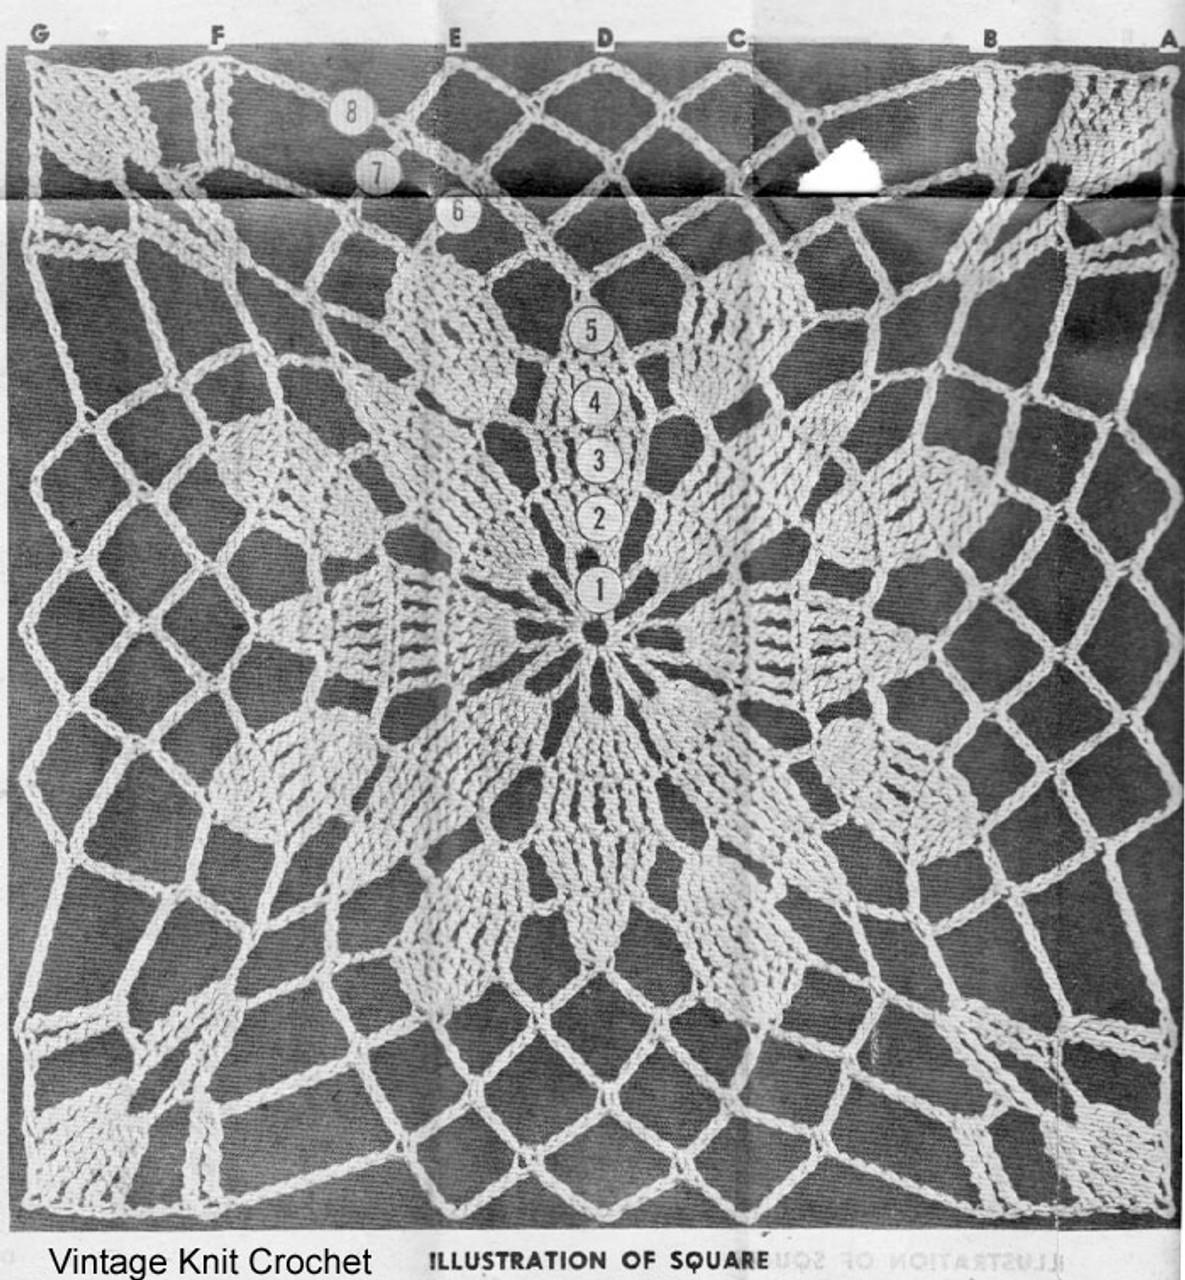 Crochet Square Pattern Illustration, Laura Wheeler 760